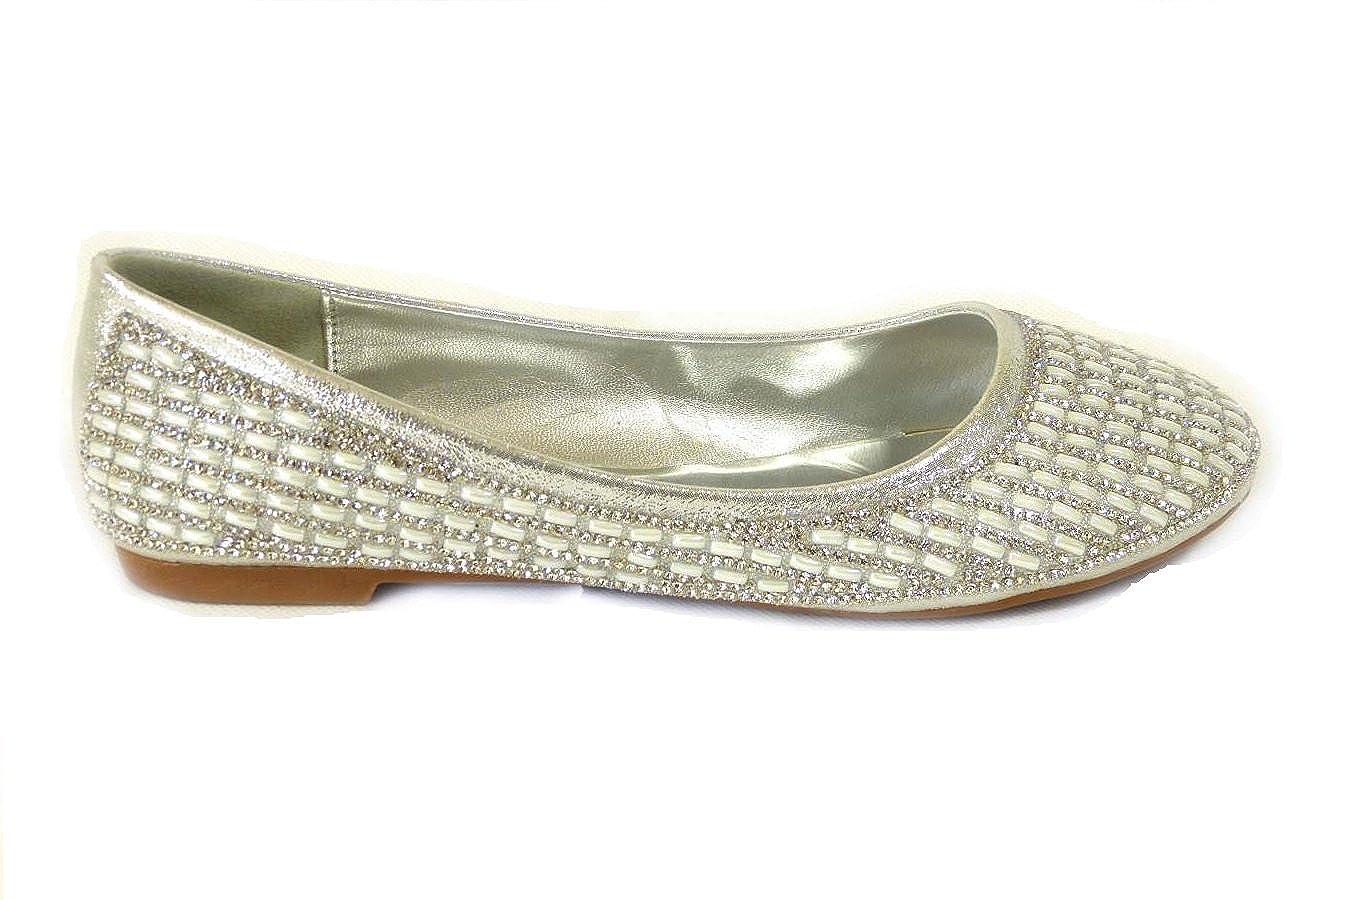 de92eee9f78 New Womens Bridal Diamante Wedding Ladies Sparkly Slip ON Bridesmaid Shoes  Pumps Size 3 4 5 6 7 8  Amazon.co.uk  Shoes   Bags